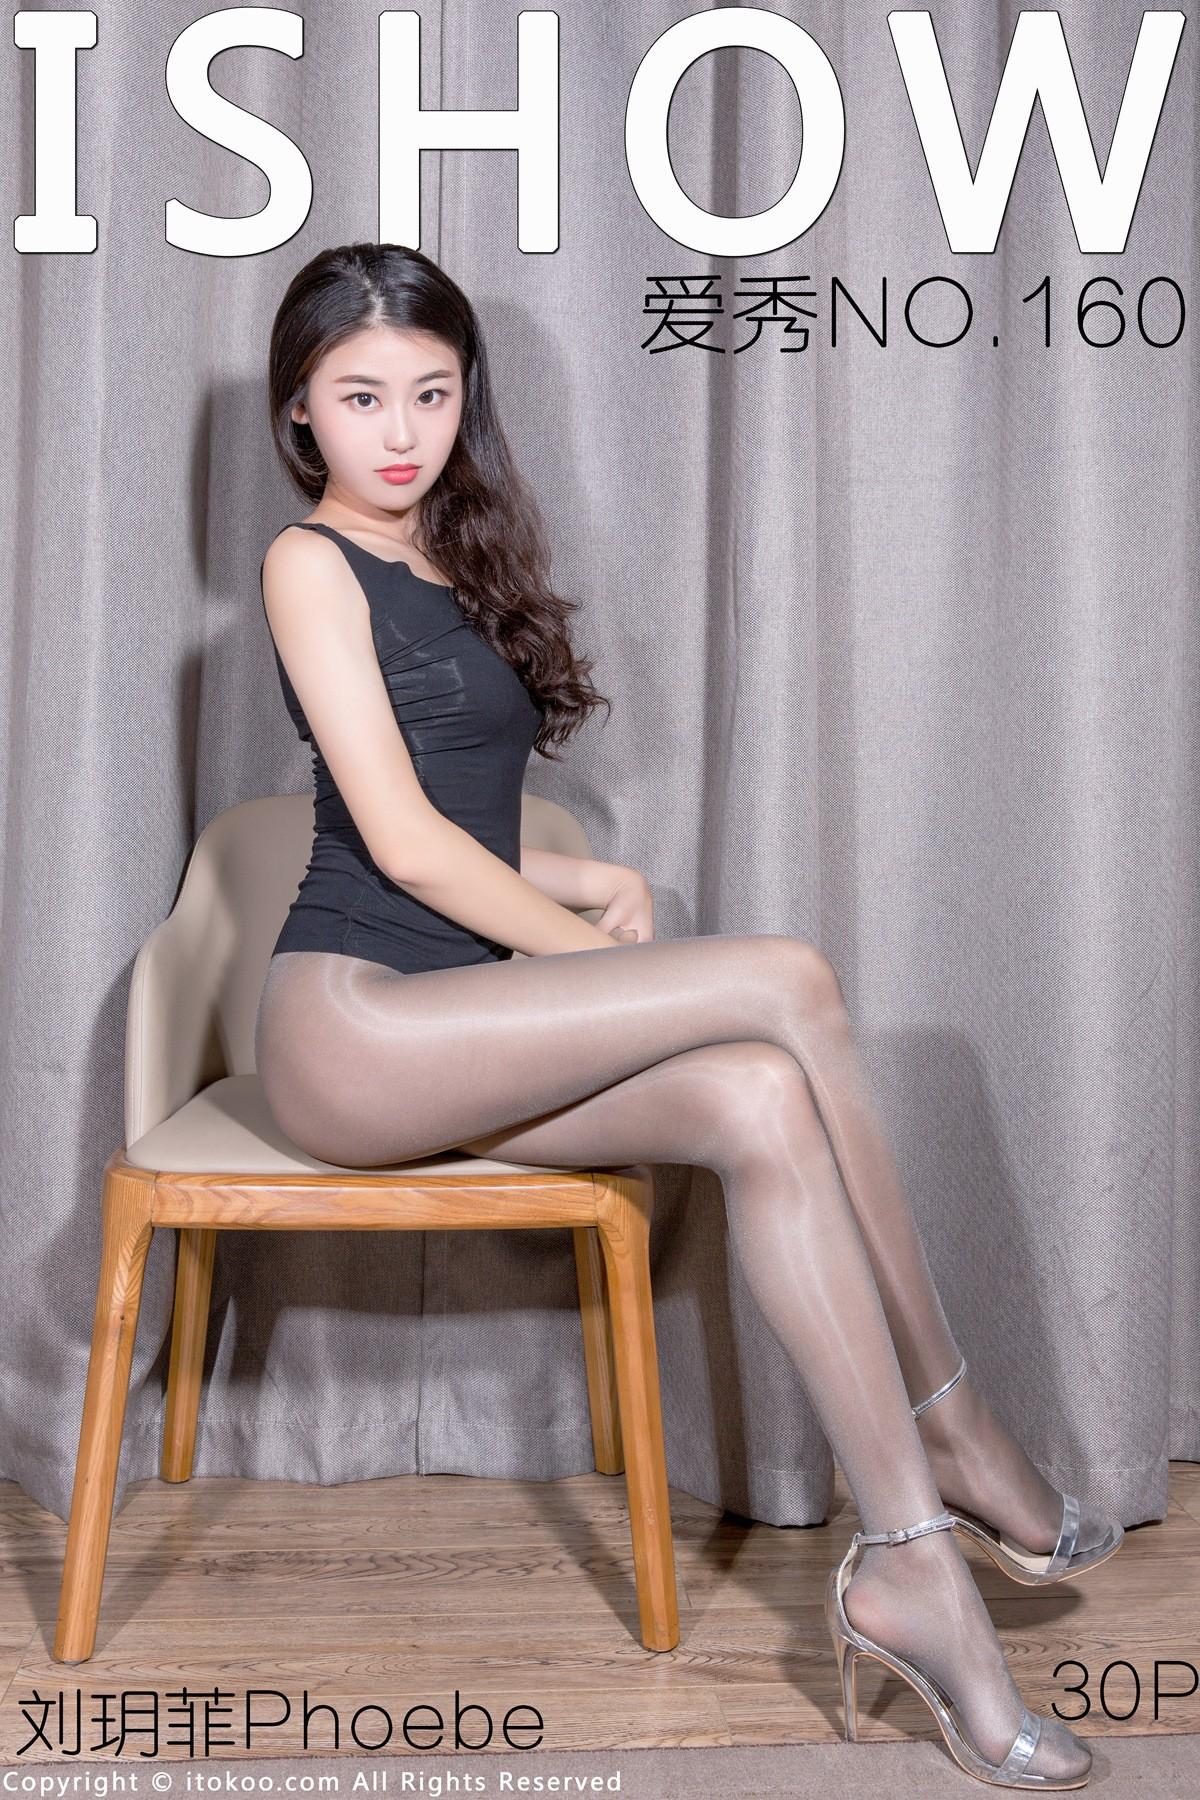 [ISHOW爱秀]2018-07-07 NO.160 刘玥菲Phoebe